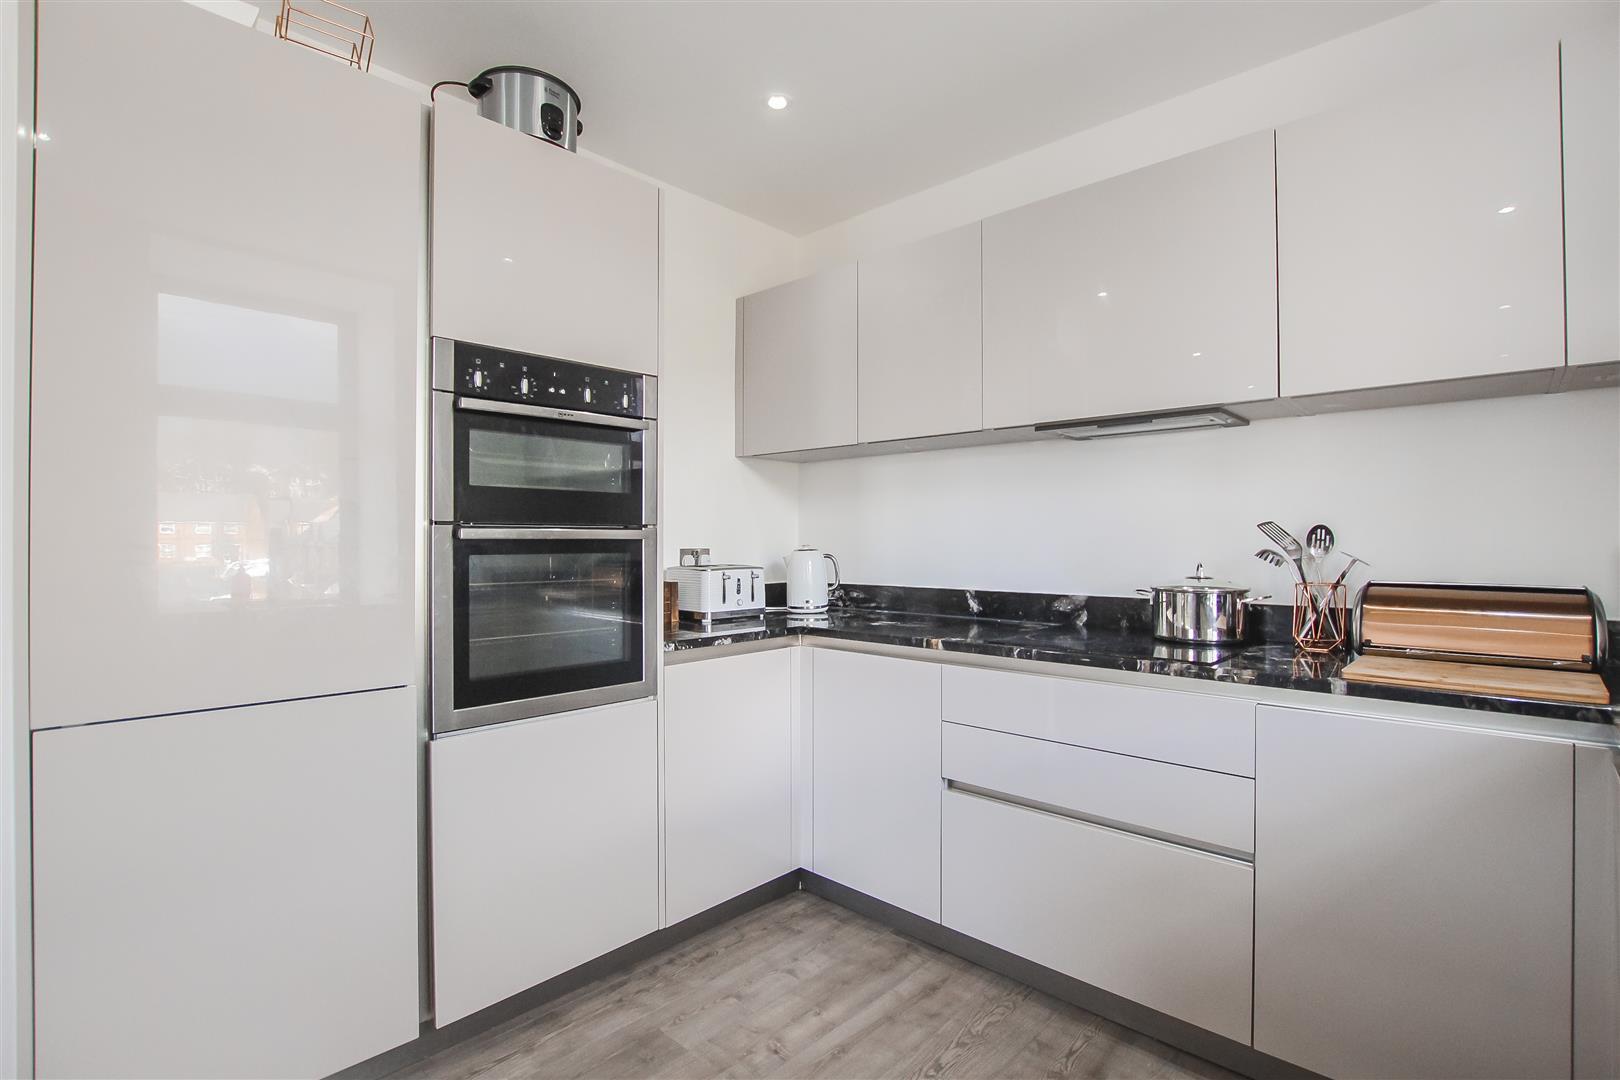 3 Bedroom Duplex Apartment For Sale - Image 37